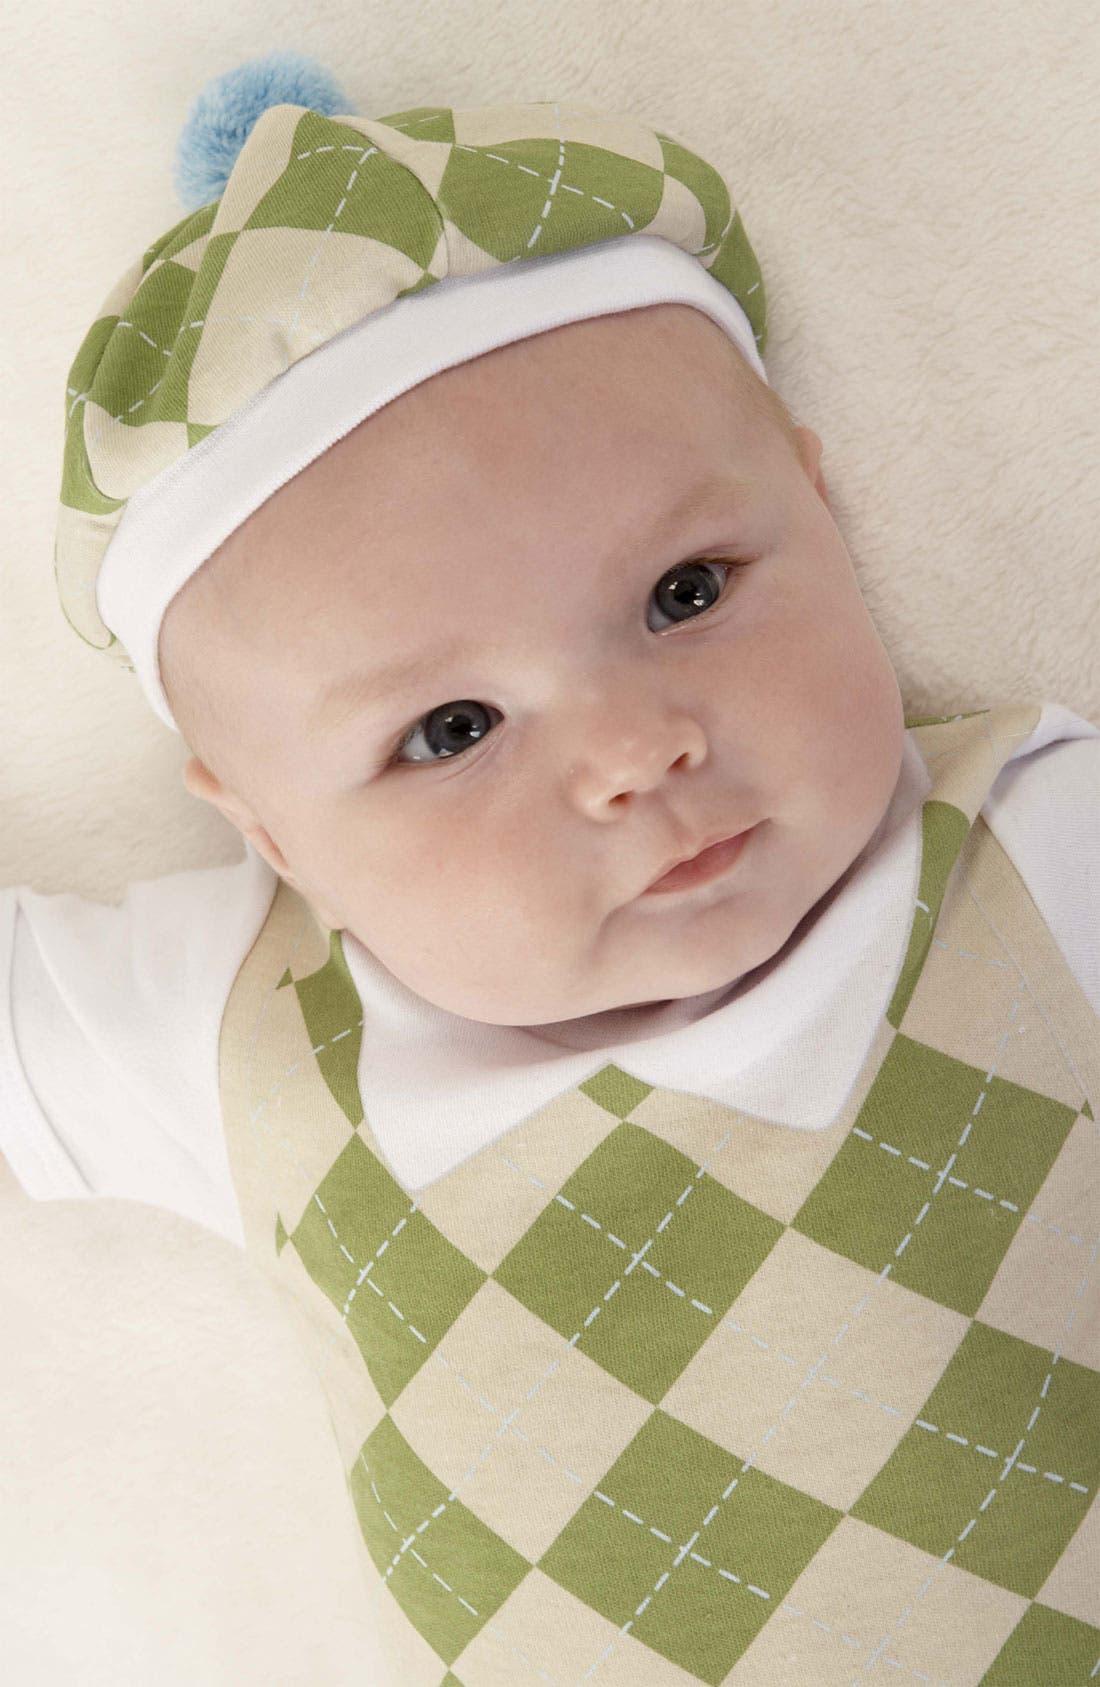 Alternate Image 1 Selected - Baby Aspen 'Sweet Tea' Bodysuit, Booties & Hat Set (Baby)